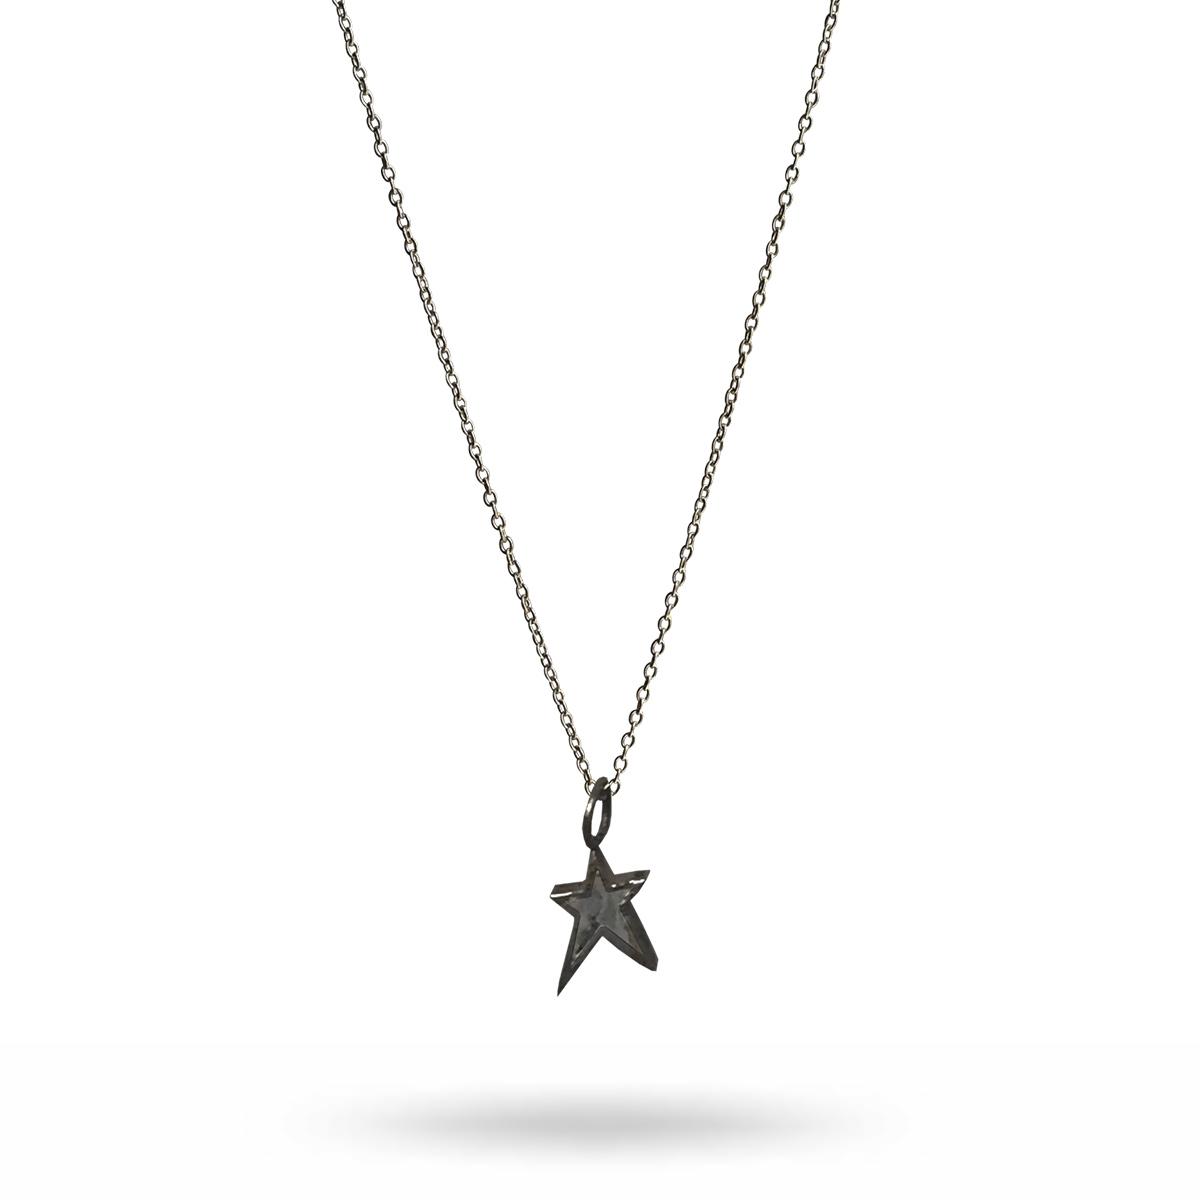 N140220_Star_necklace_black_2112x2112